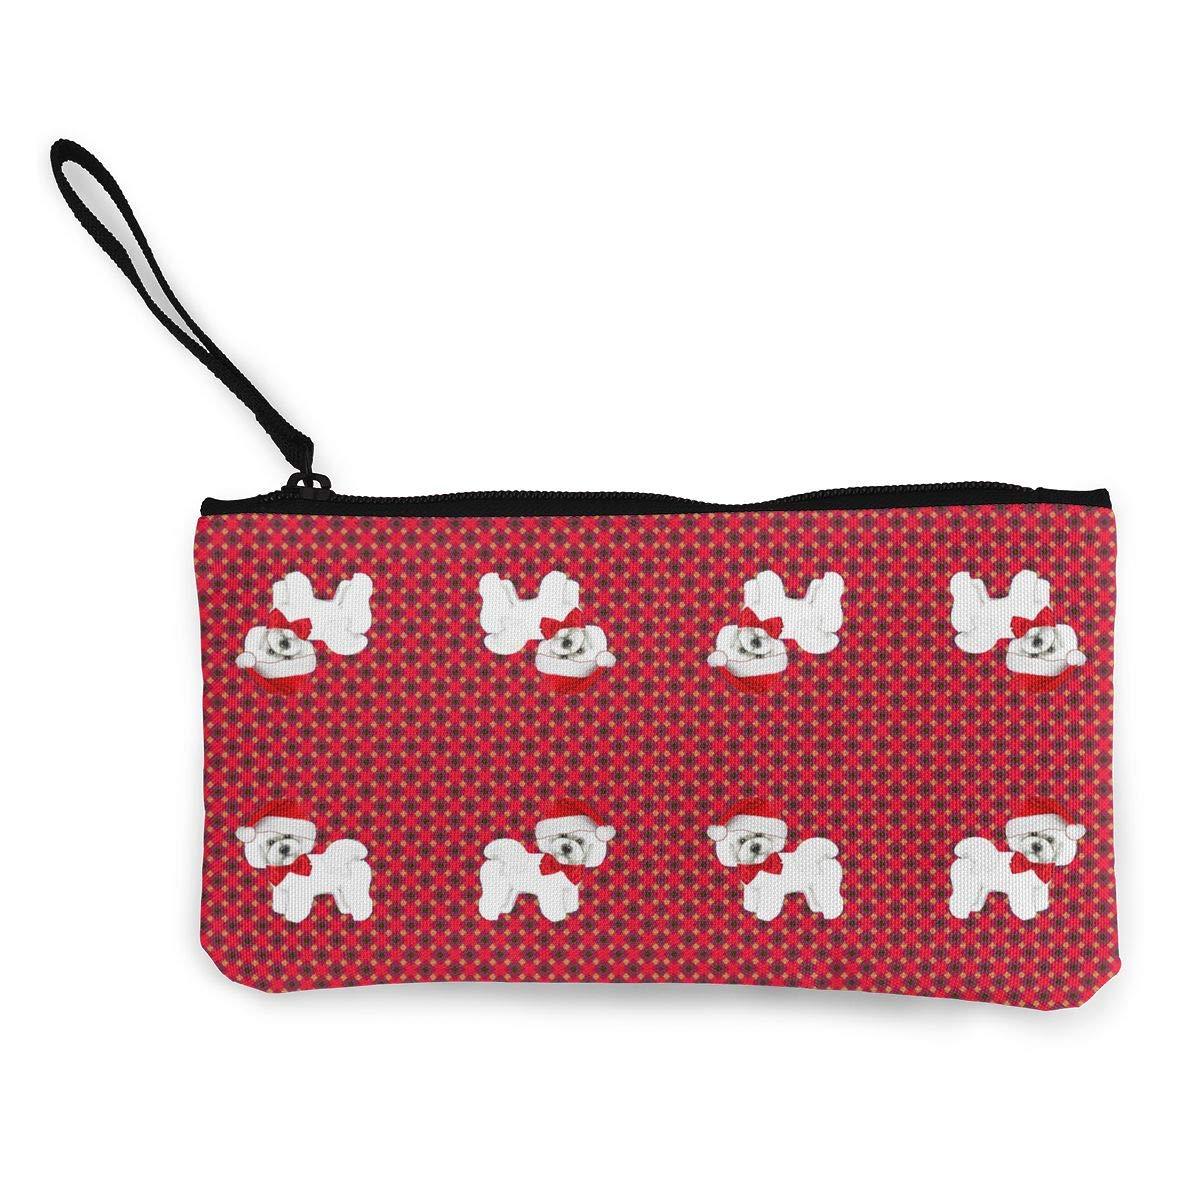 Bichon Frise Christmas Zipper Canvas Coin Purse Wallet Make Up Bag,Cellphone Bag With Handle